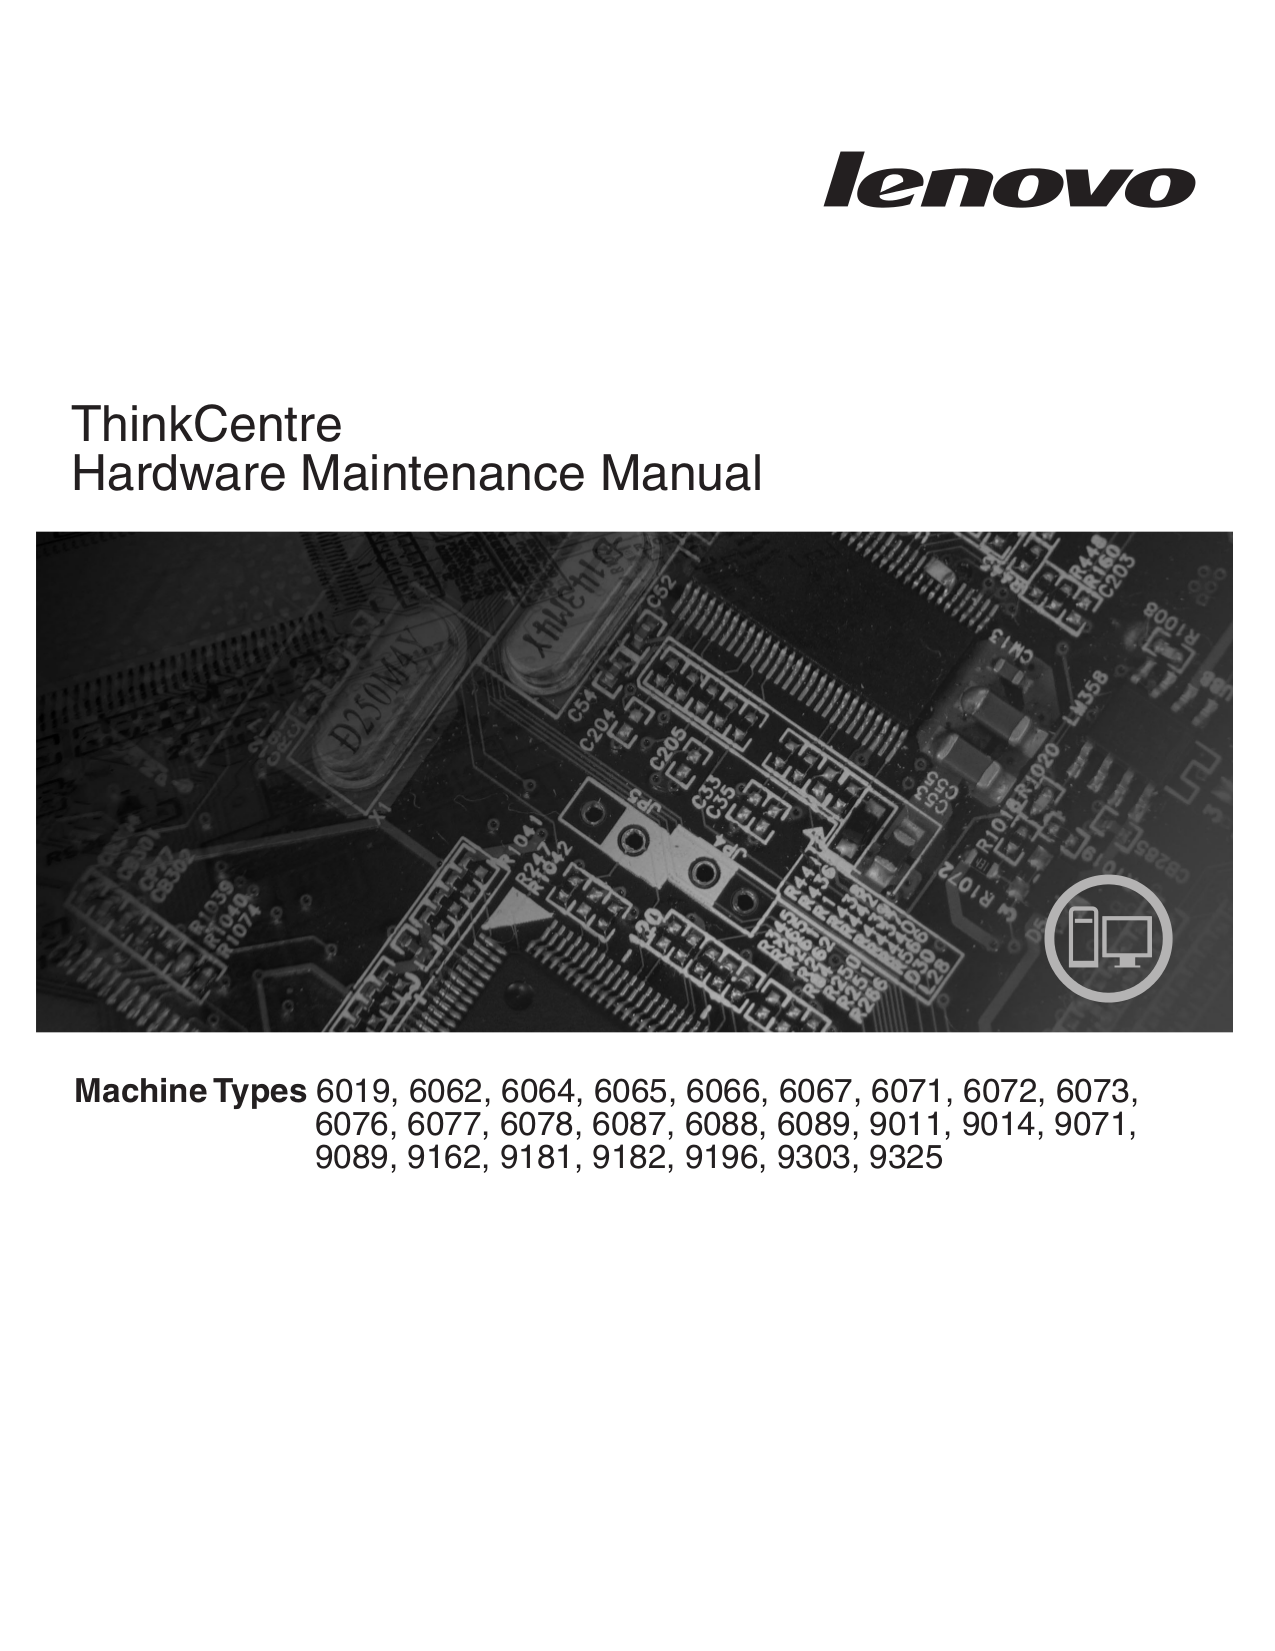 pdf for Lenovo Desktop ThinkCentre M57 6087 manual